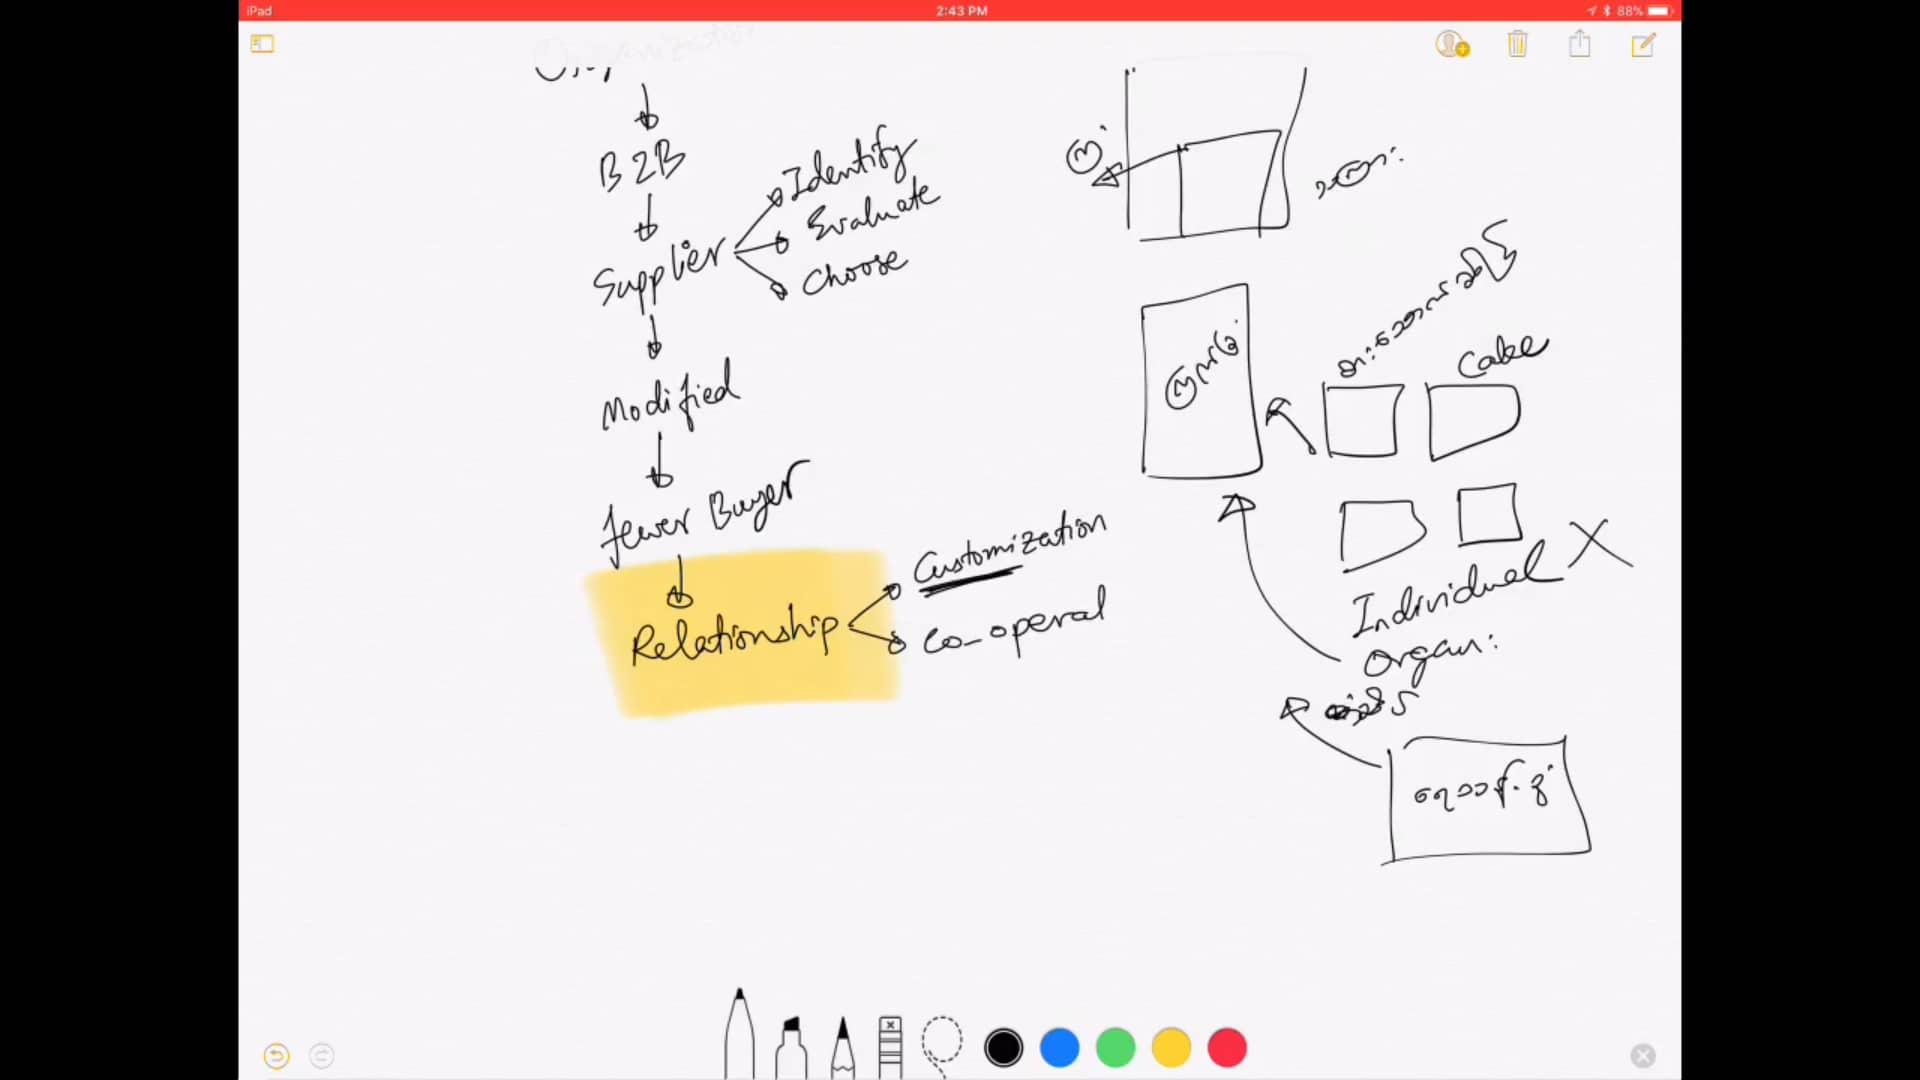 Ch 5 - Organisational Buying Behavior